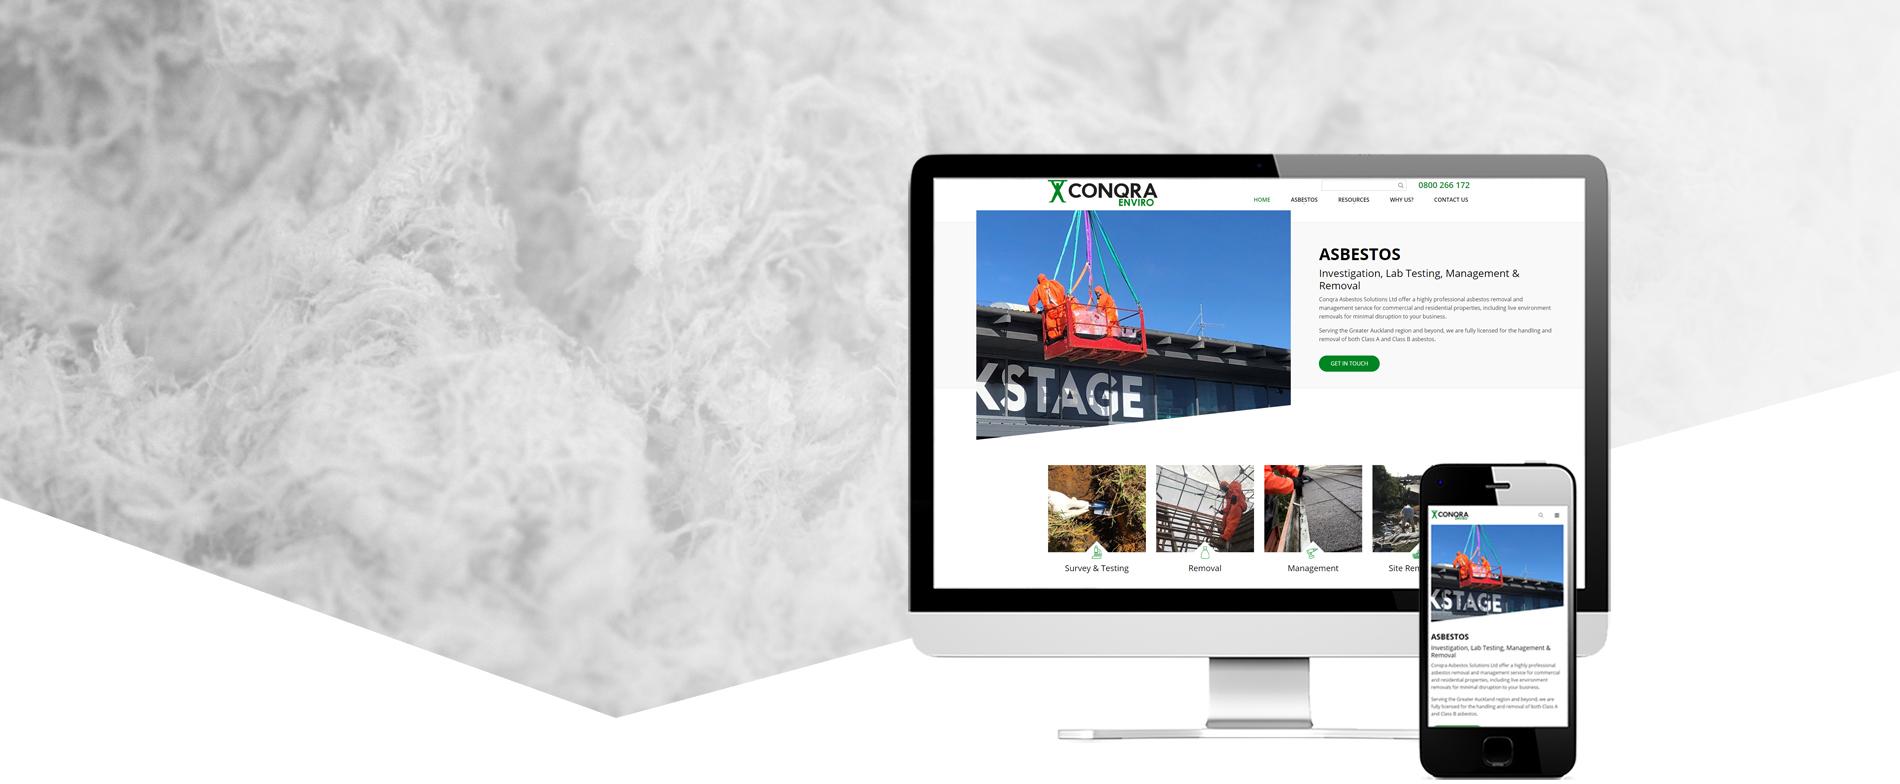 Conqra Asbestos Project Banner - Conqra Asbestos Website Design